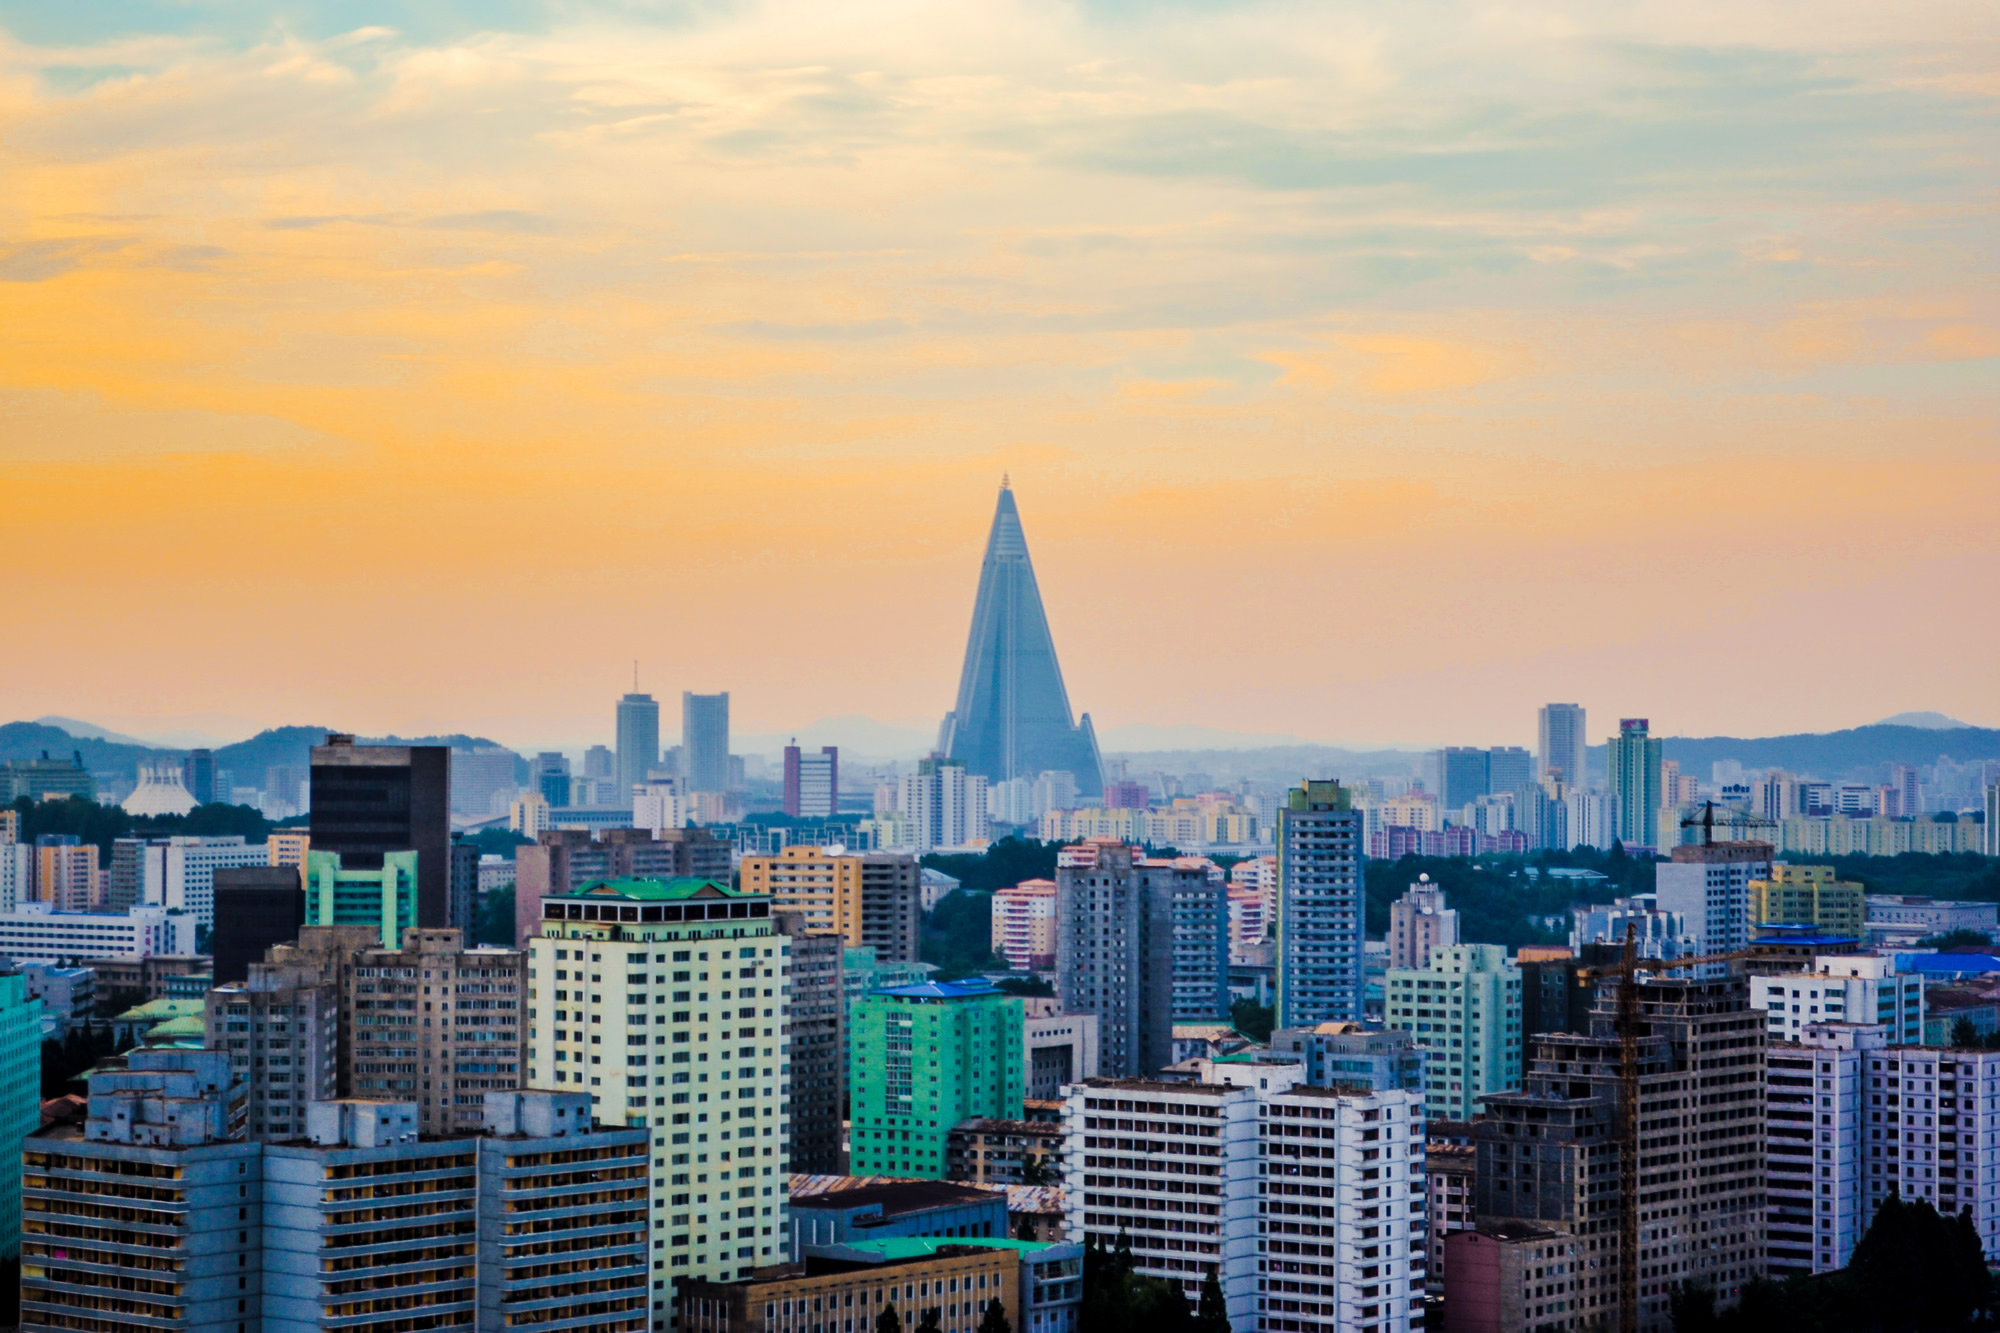 Pyramid-shaped skyscraper Pyongyang, North Korea